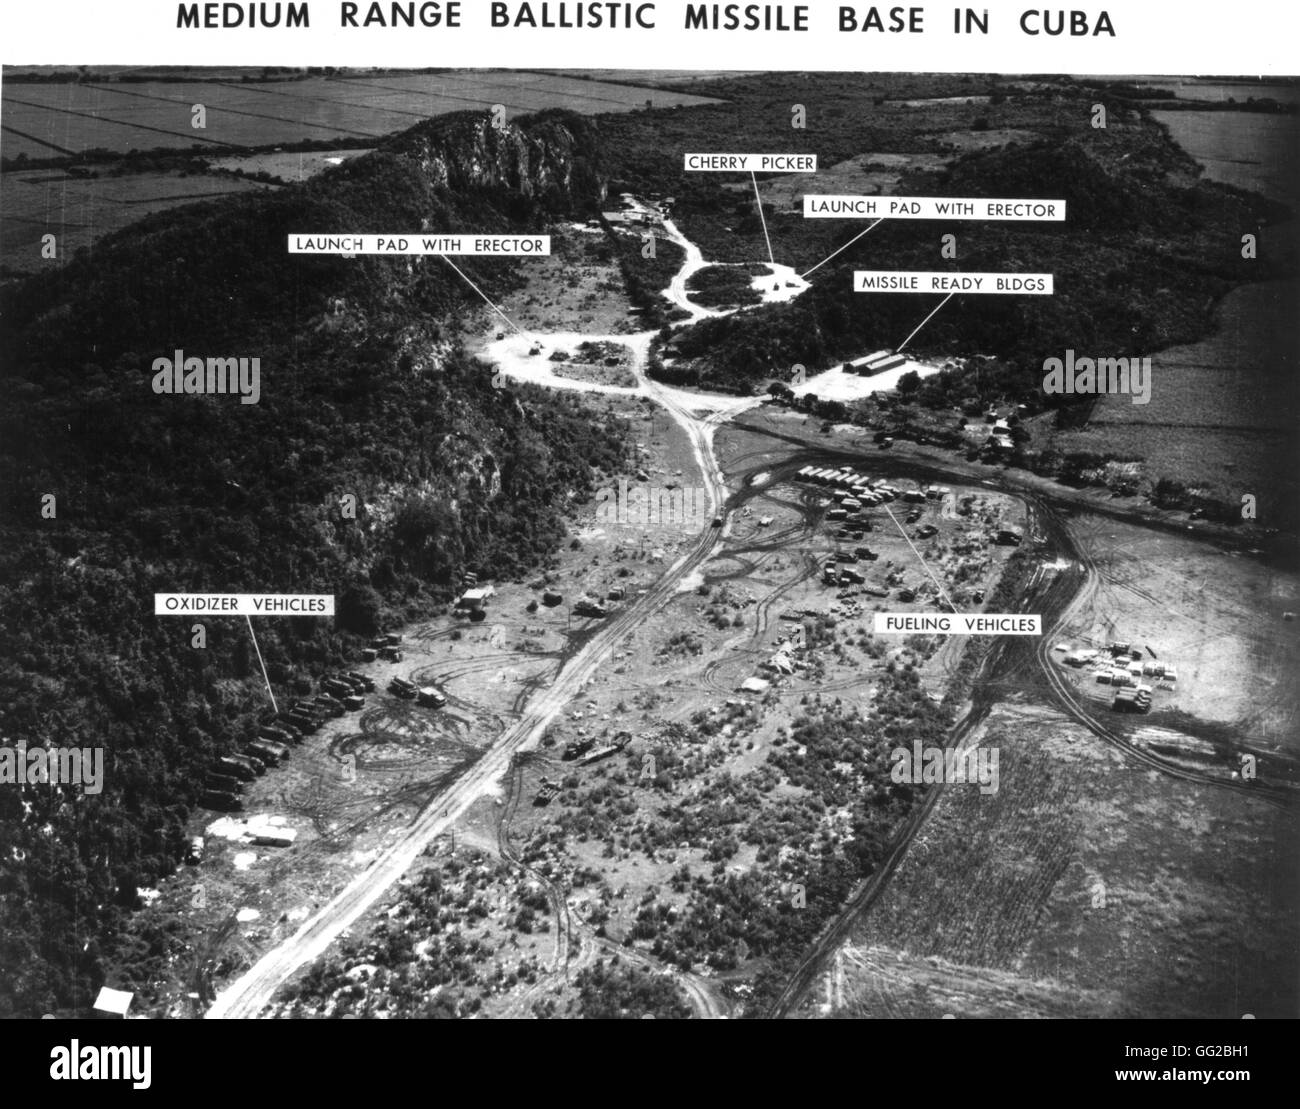 cuban missiles crisis the missiles base 1962 1963 cuba photograph us air force